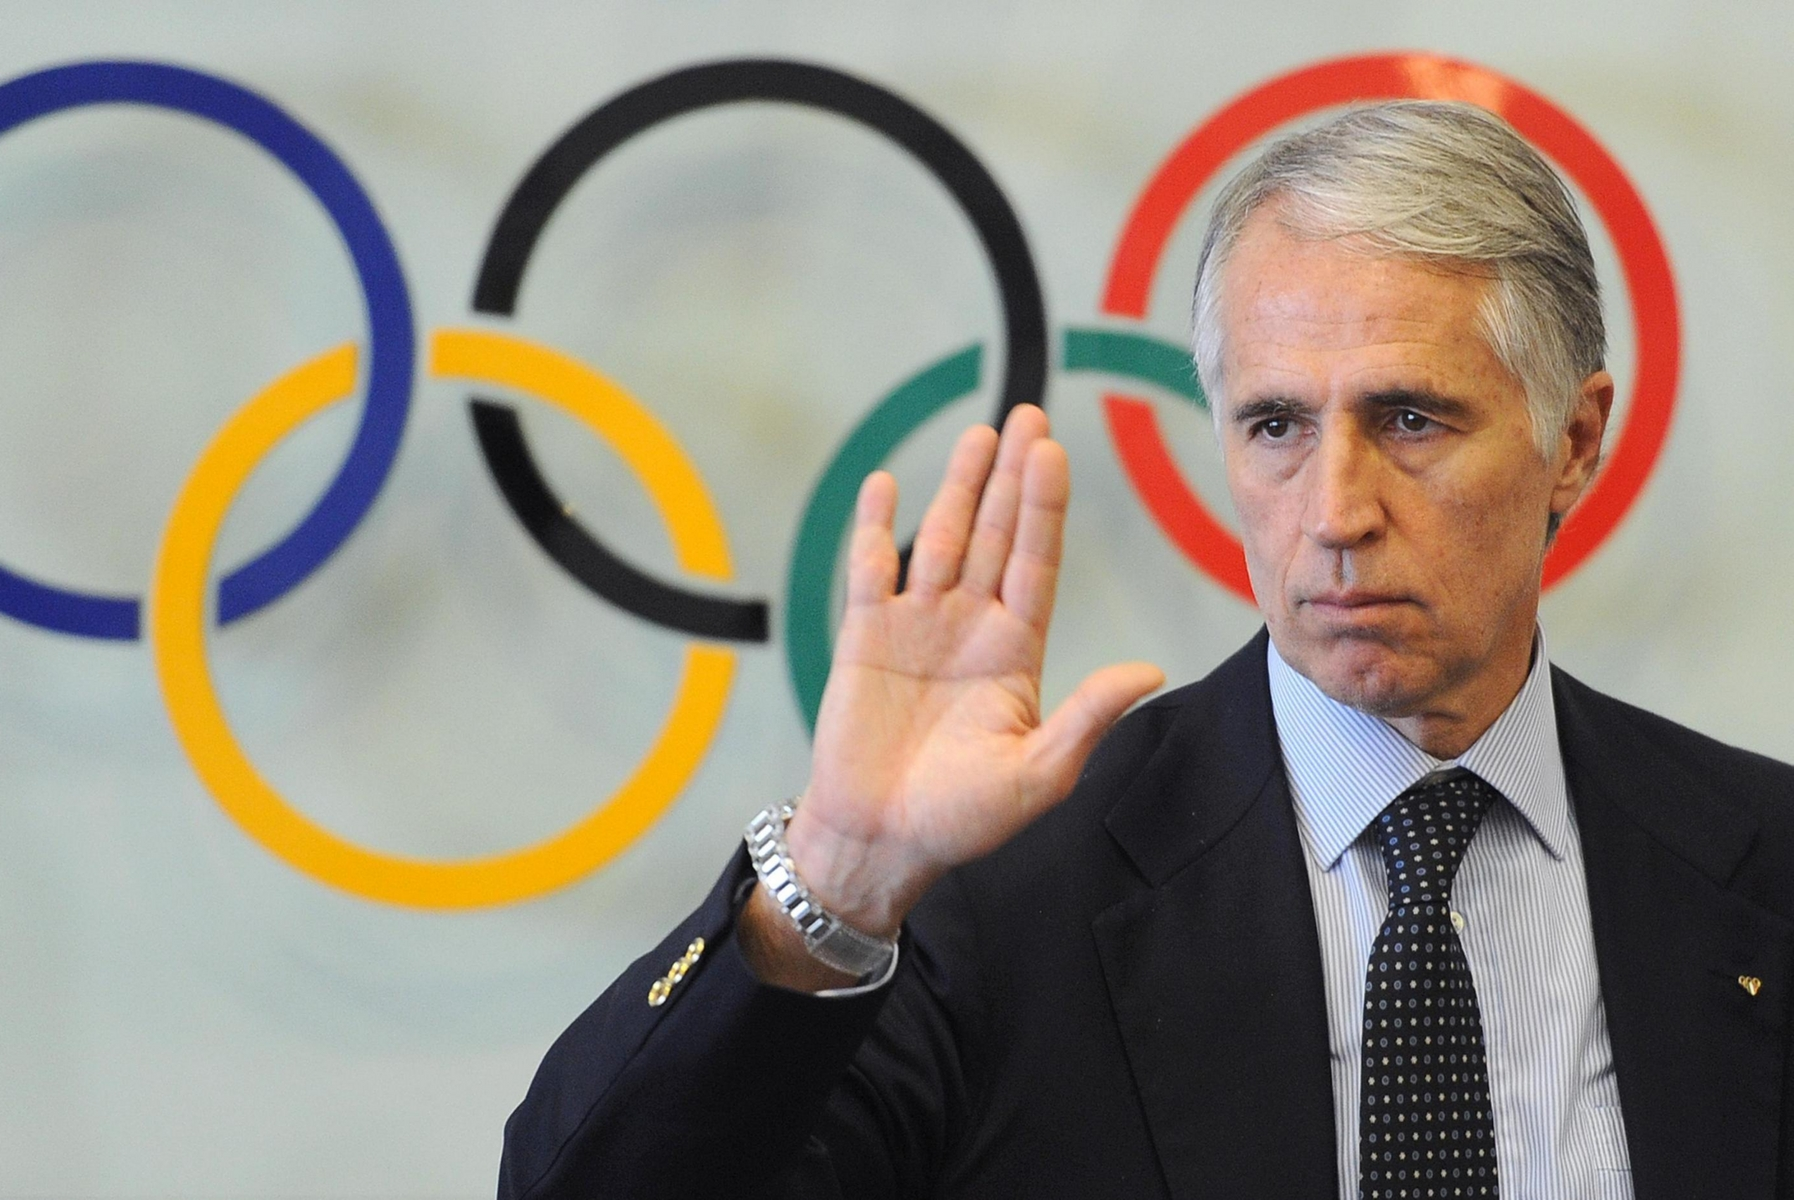 Olimpiadi e buon senso